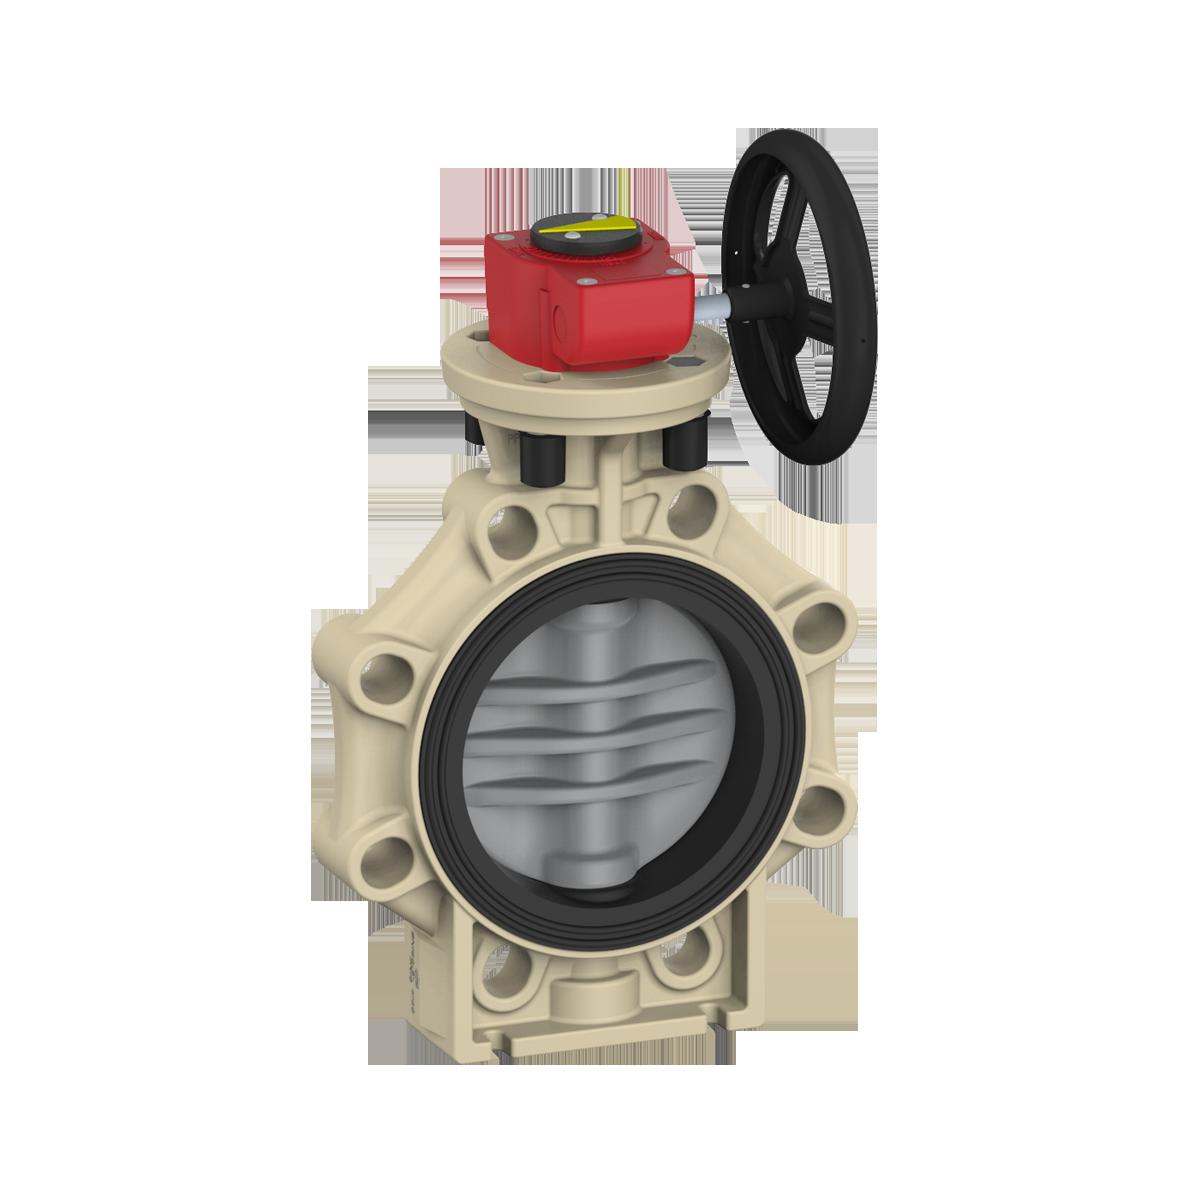 Praher_K4_butterfly_valve_cpvc_wheel, beige, grey, black, red